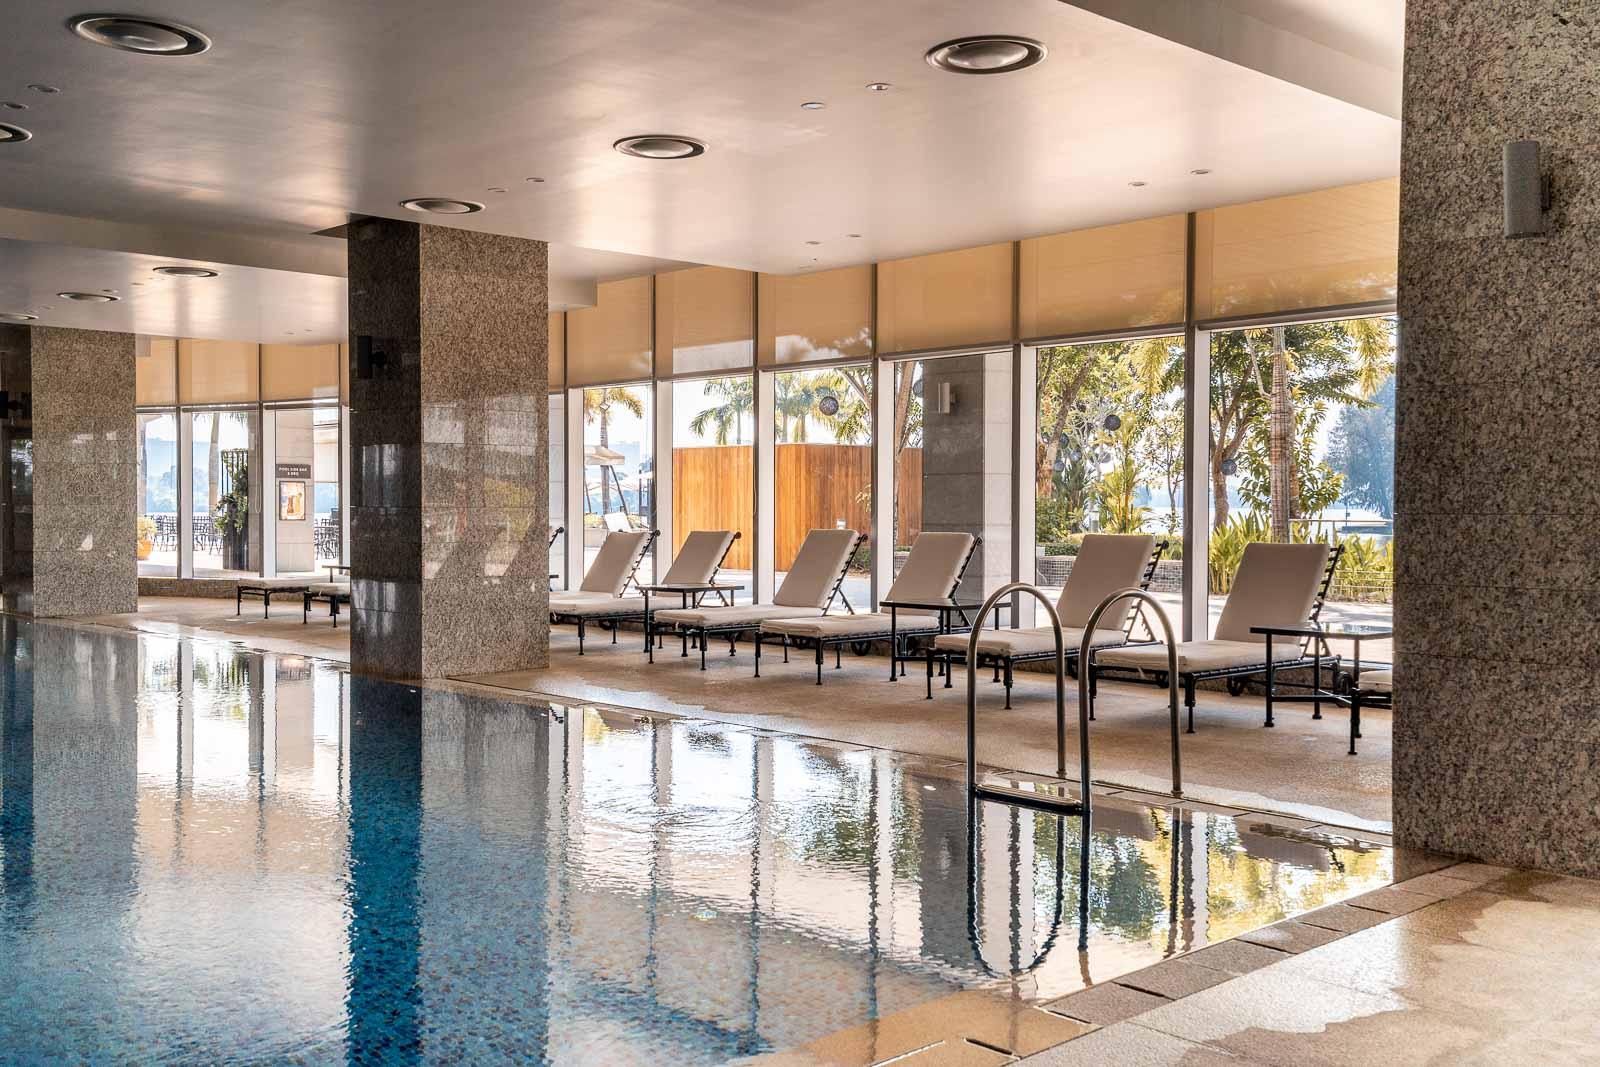 Indoor pool at Lotte Hotel Yangon